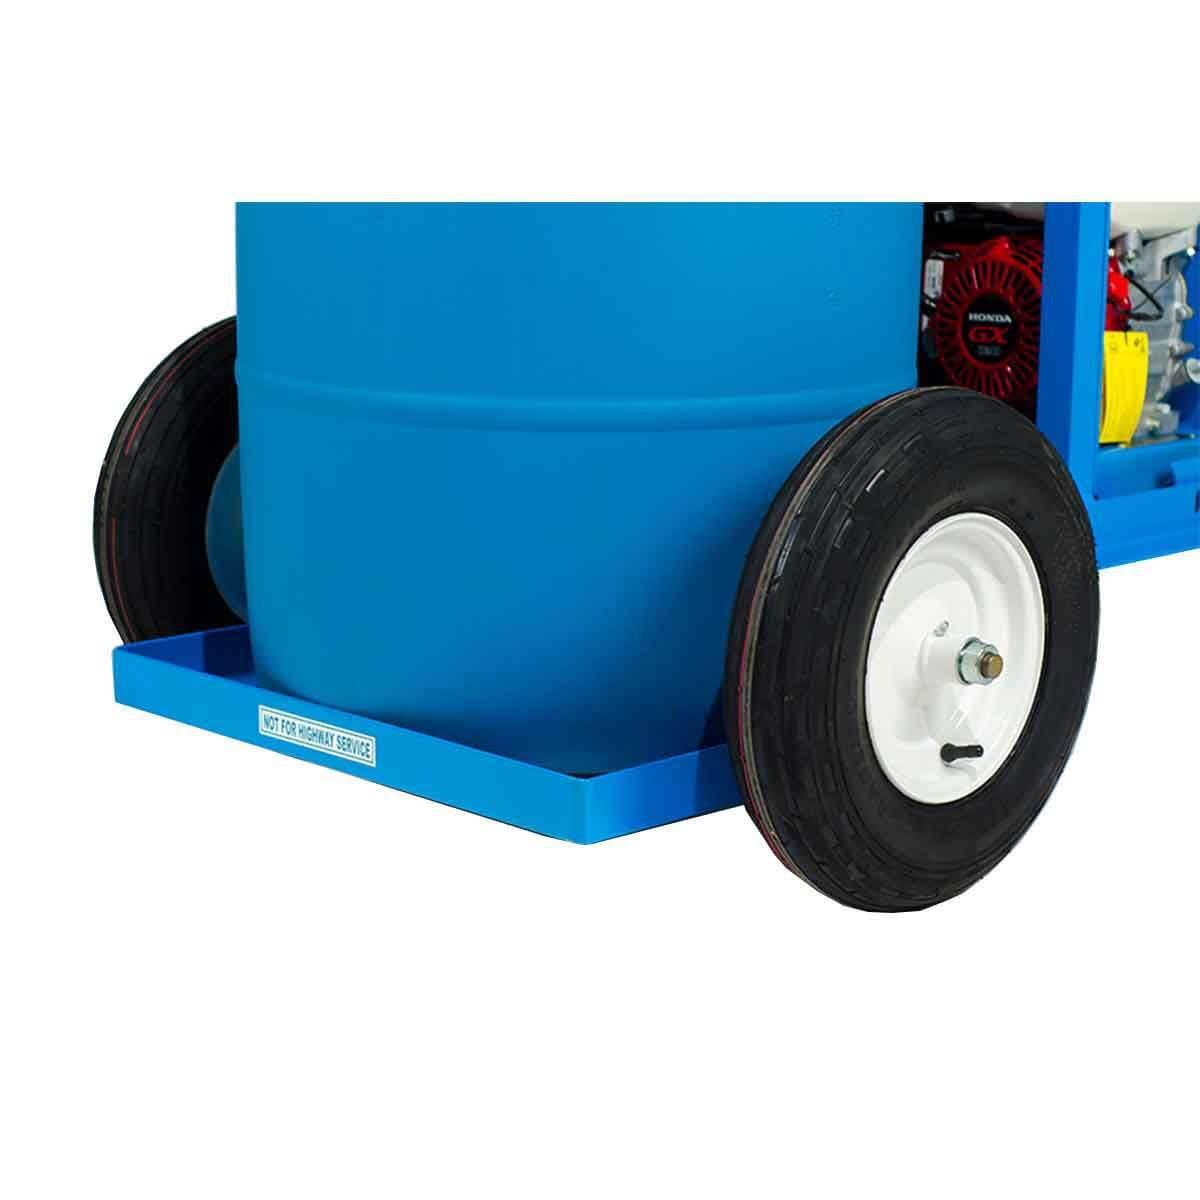 S201 Bartell Power Sprayer wheels